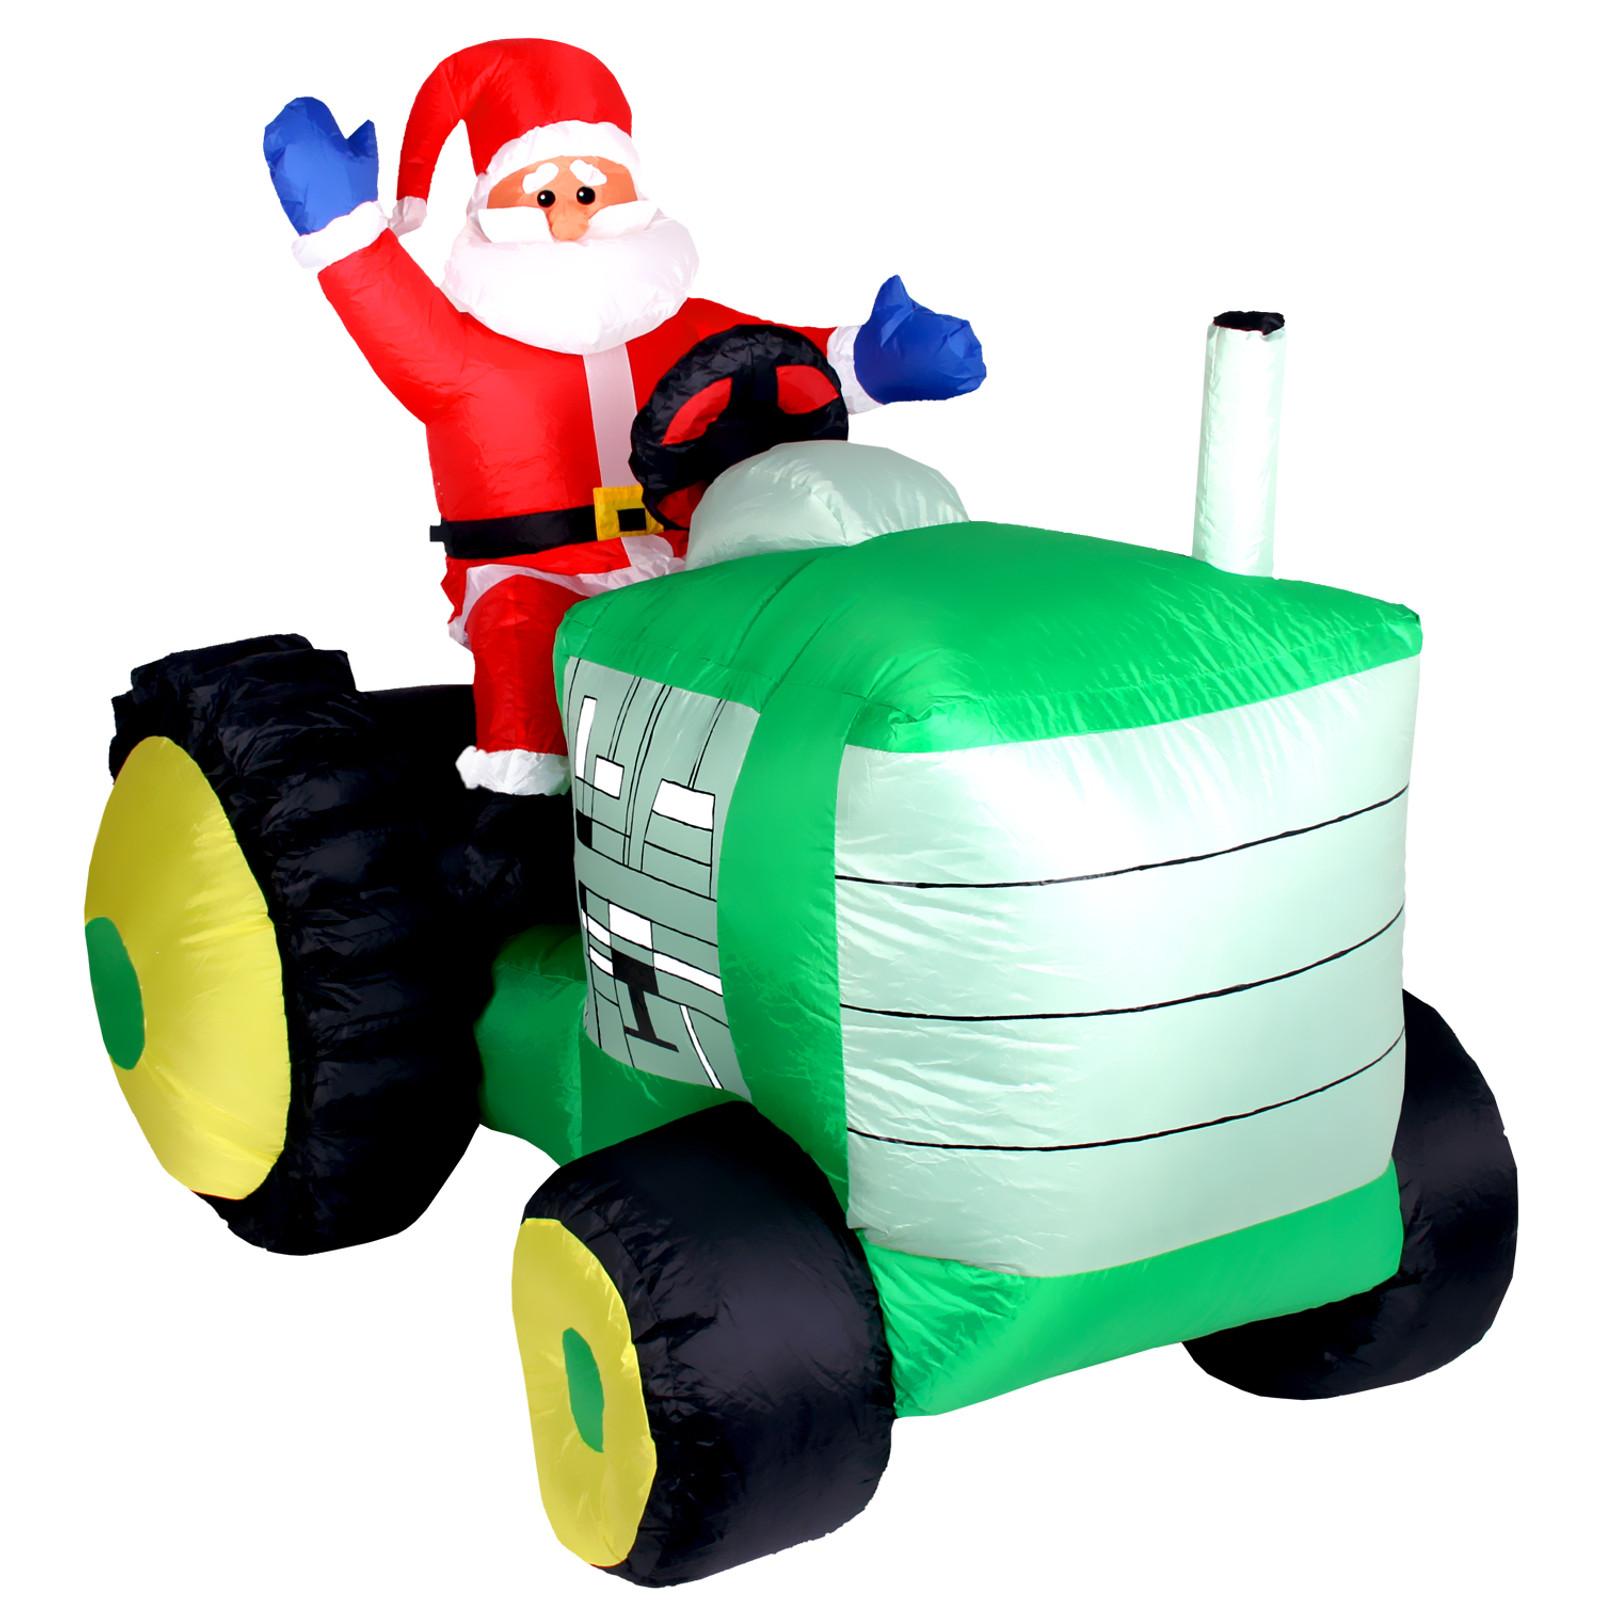 weihnachtsmann auf traktor inflatable mit led beleuchtung pridea products